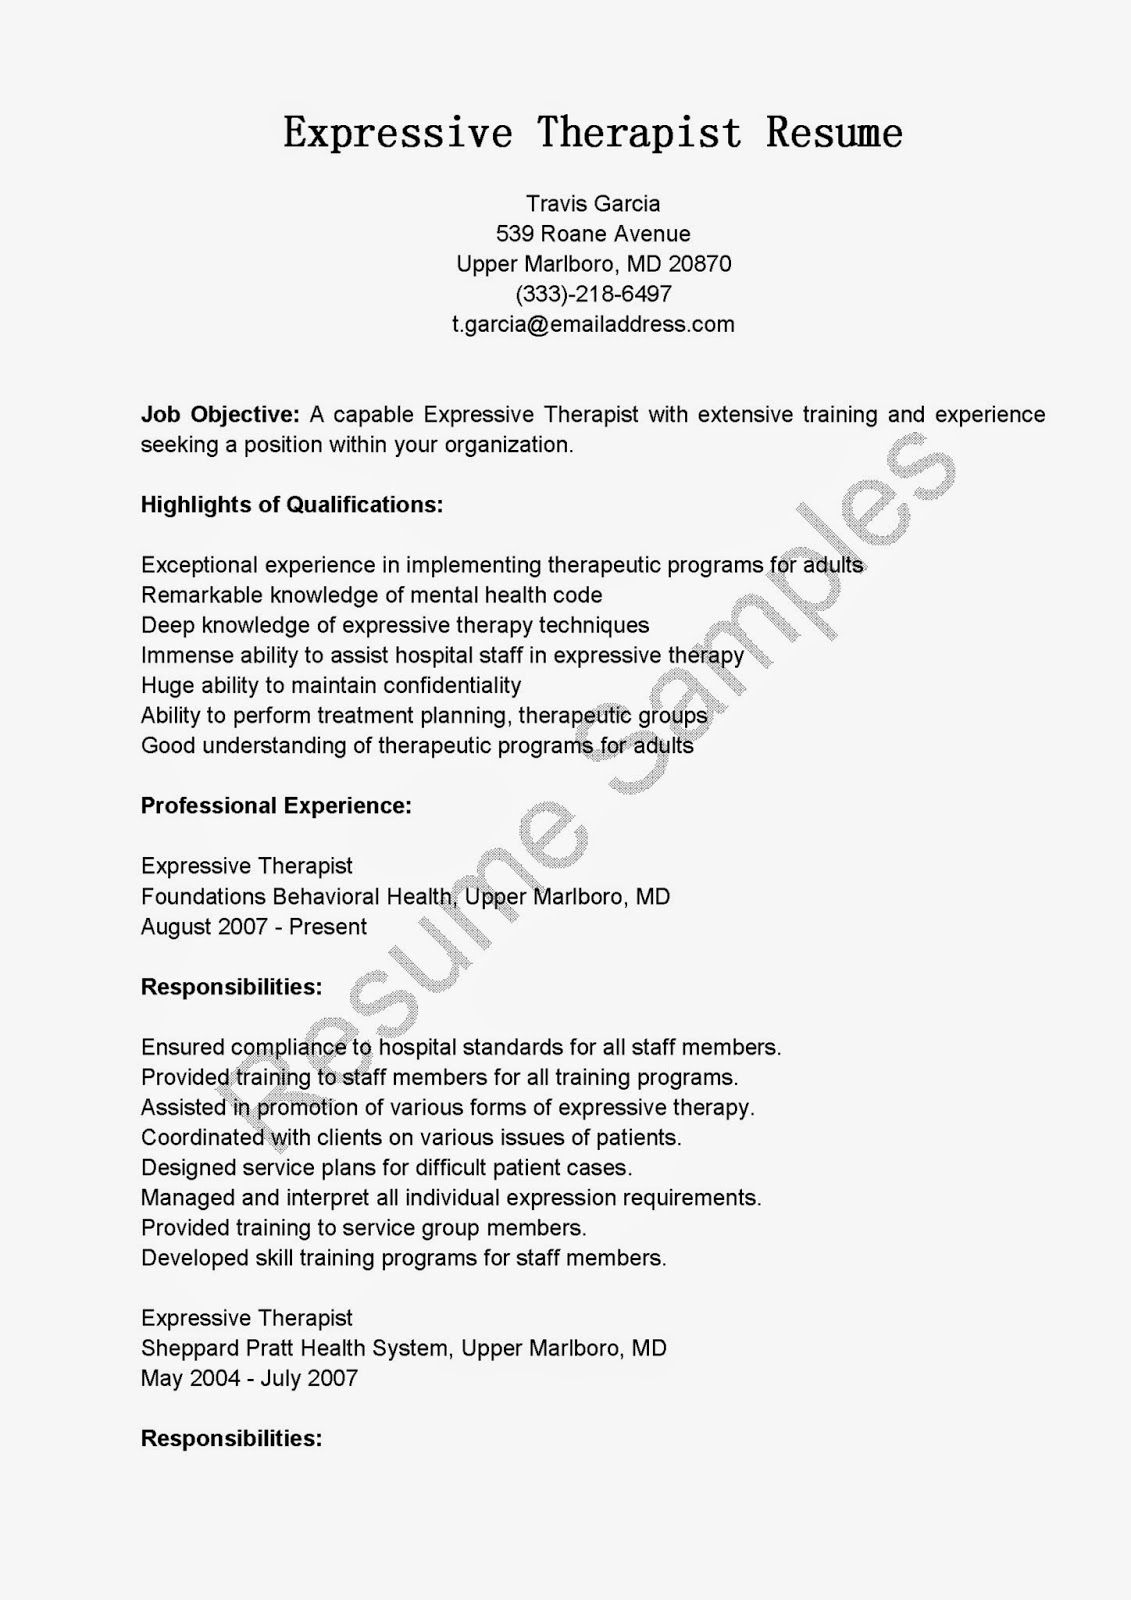 resume samples expressive therapist resume sample